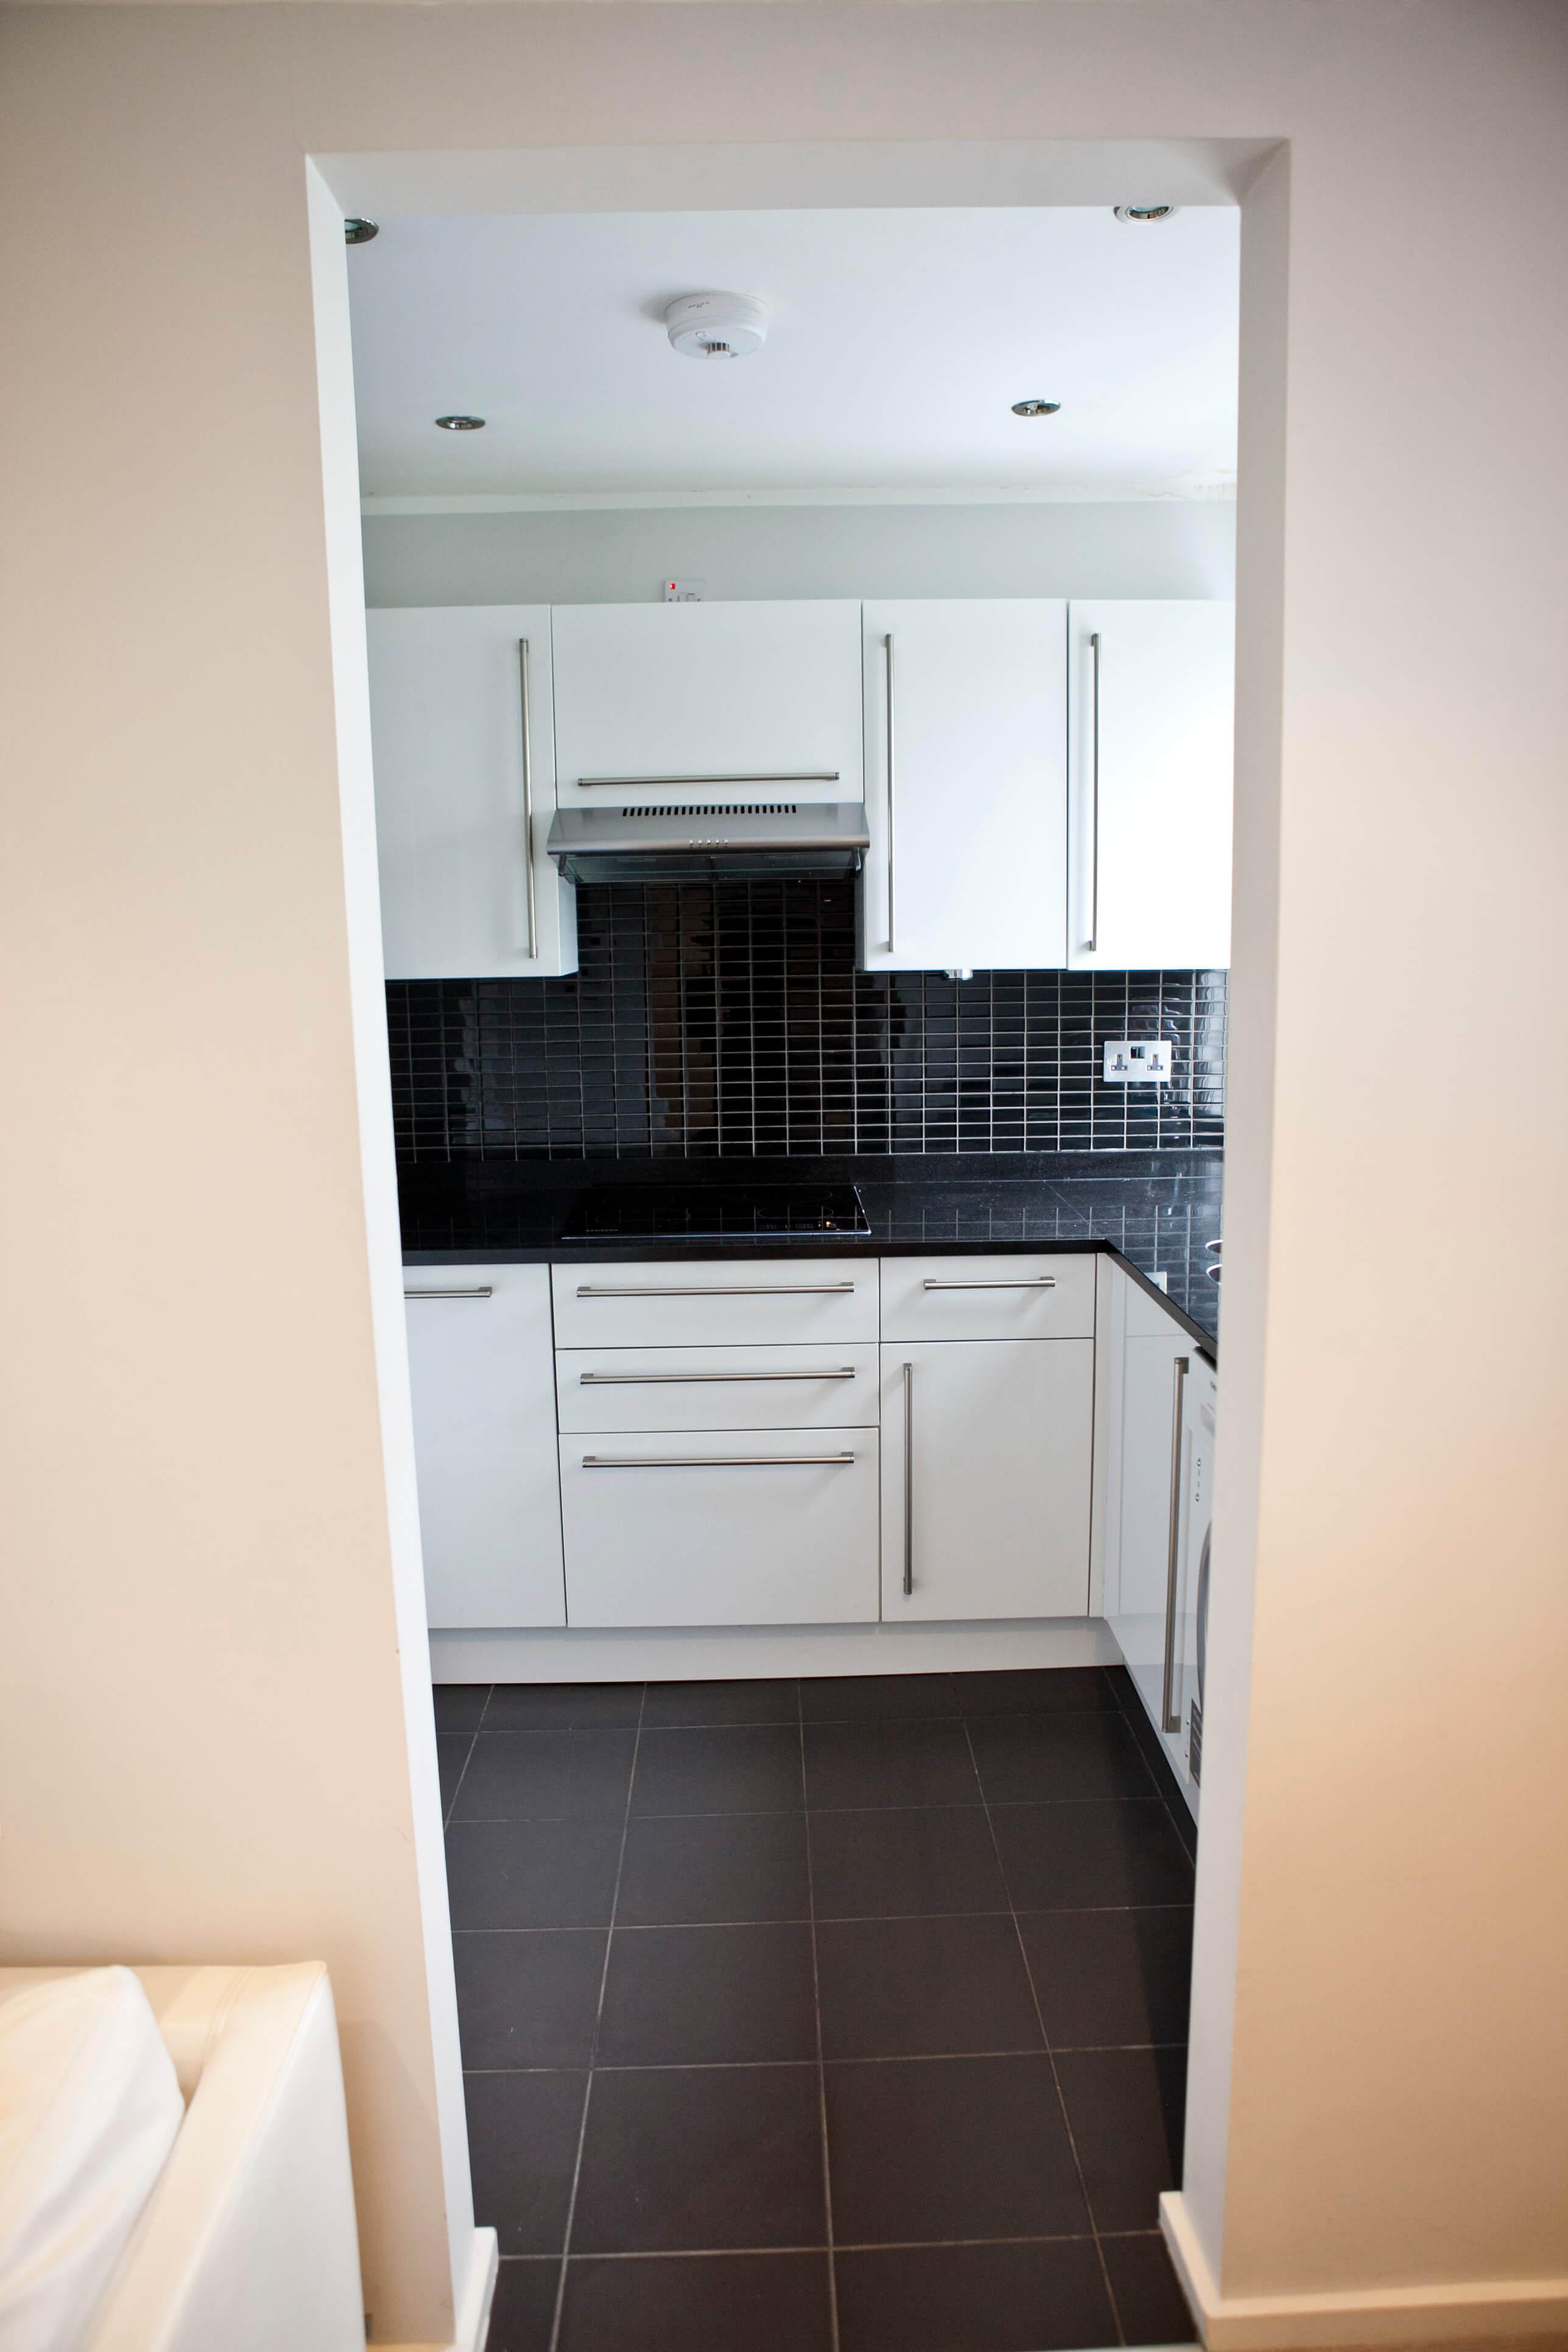 IMG 31101 - Property Listings